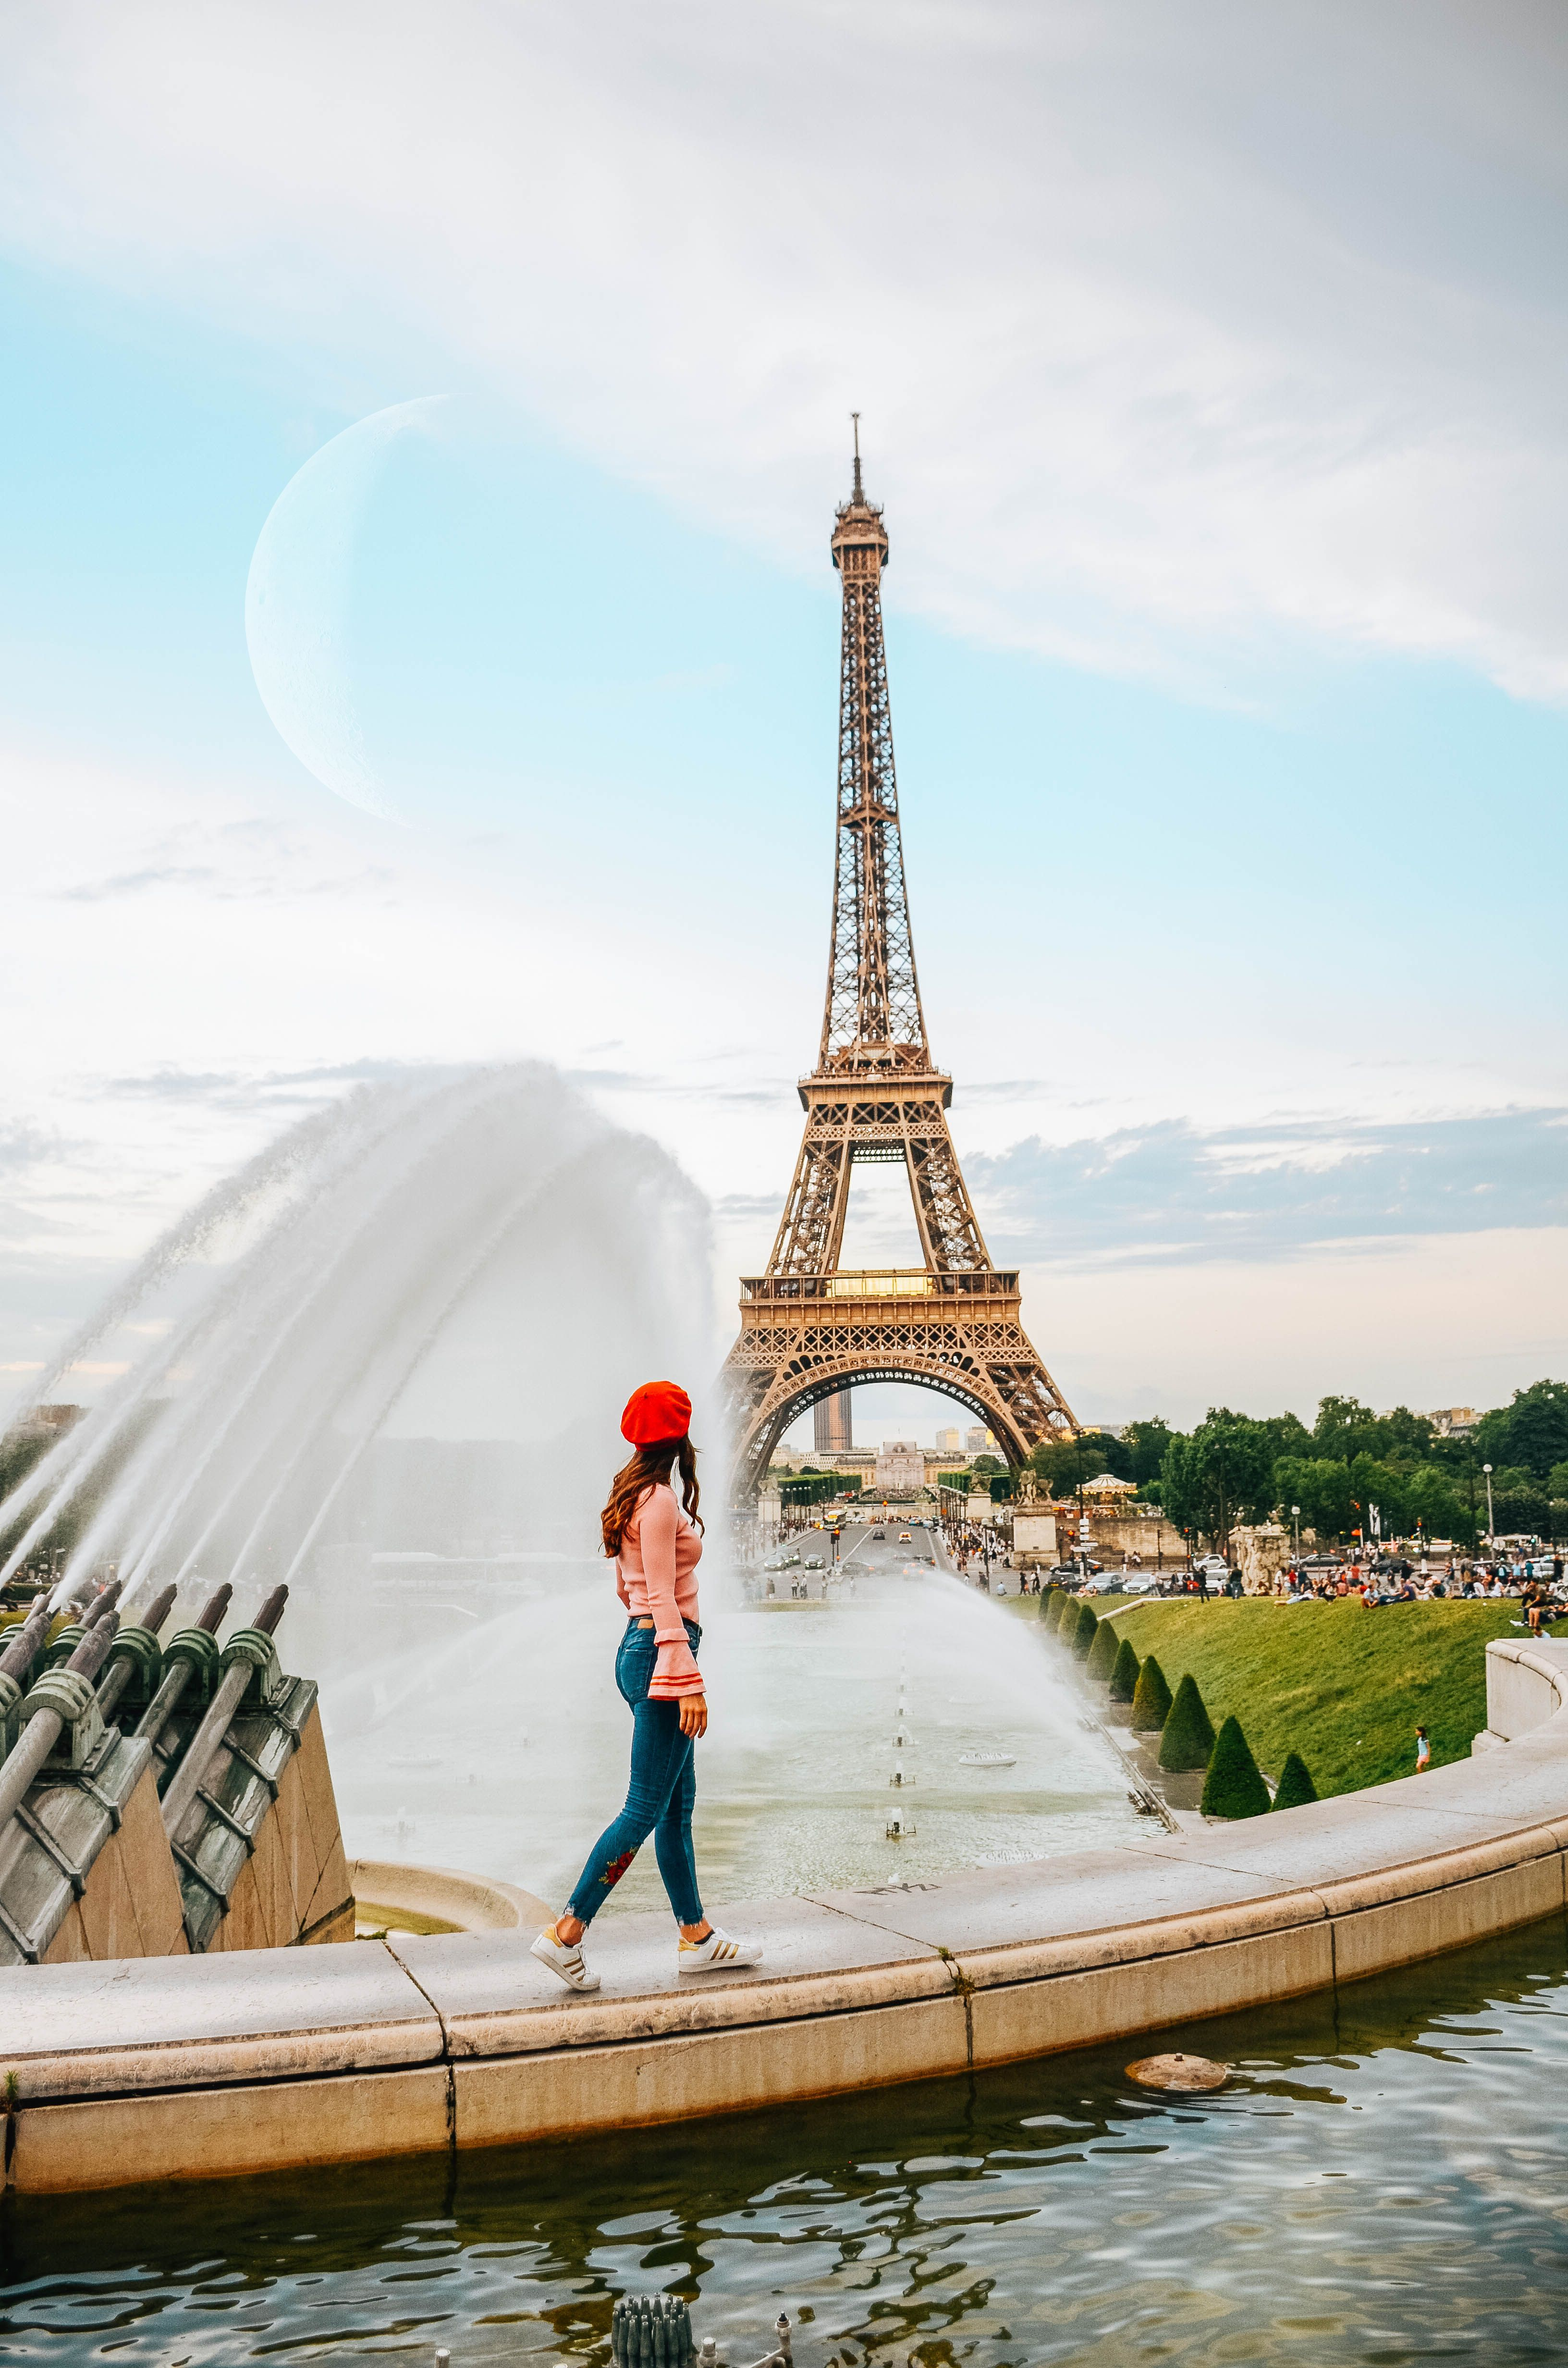 Eiffel Tower in Paris, France. The best photo spots in Paris.